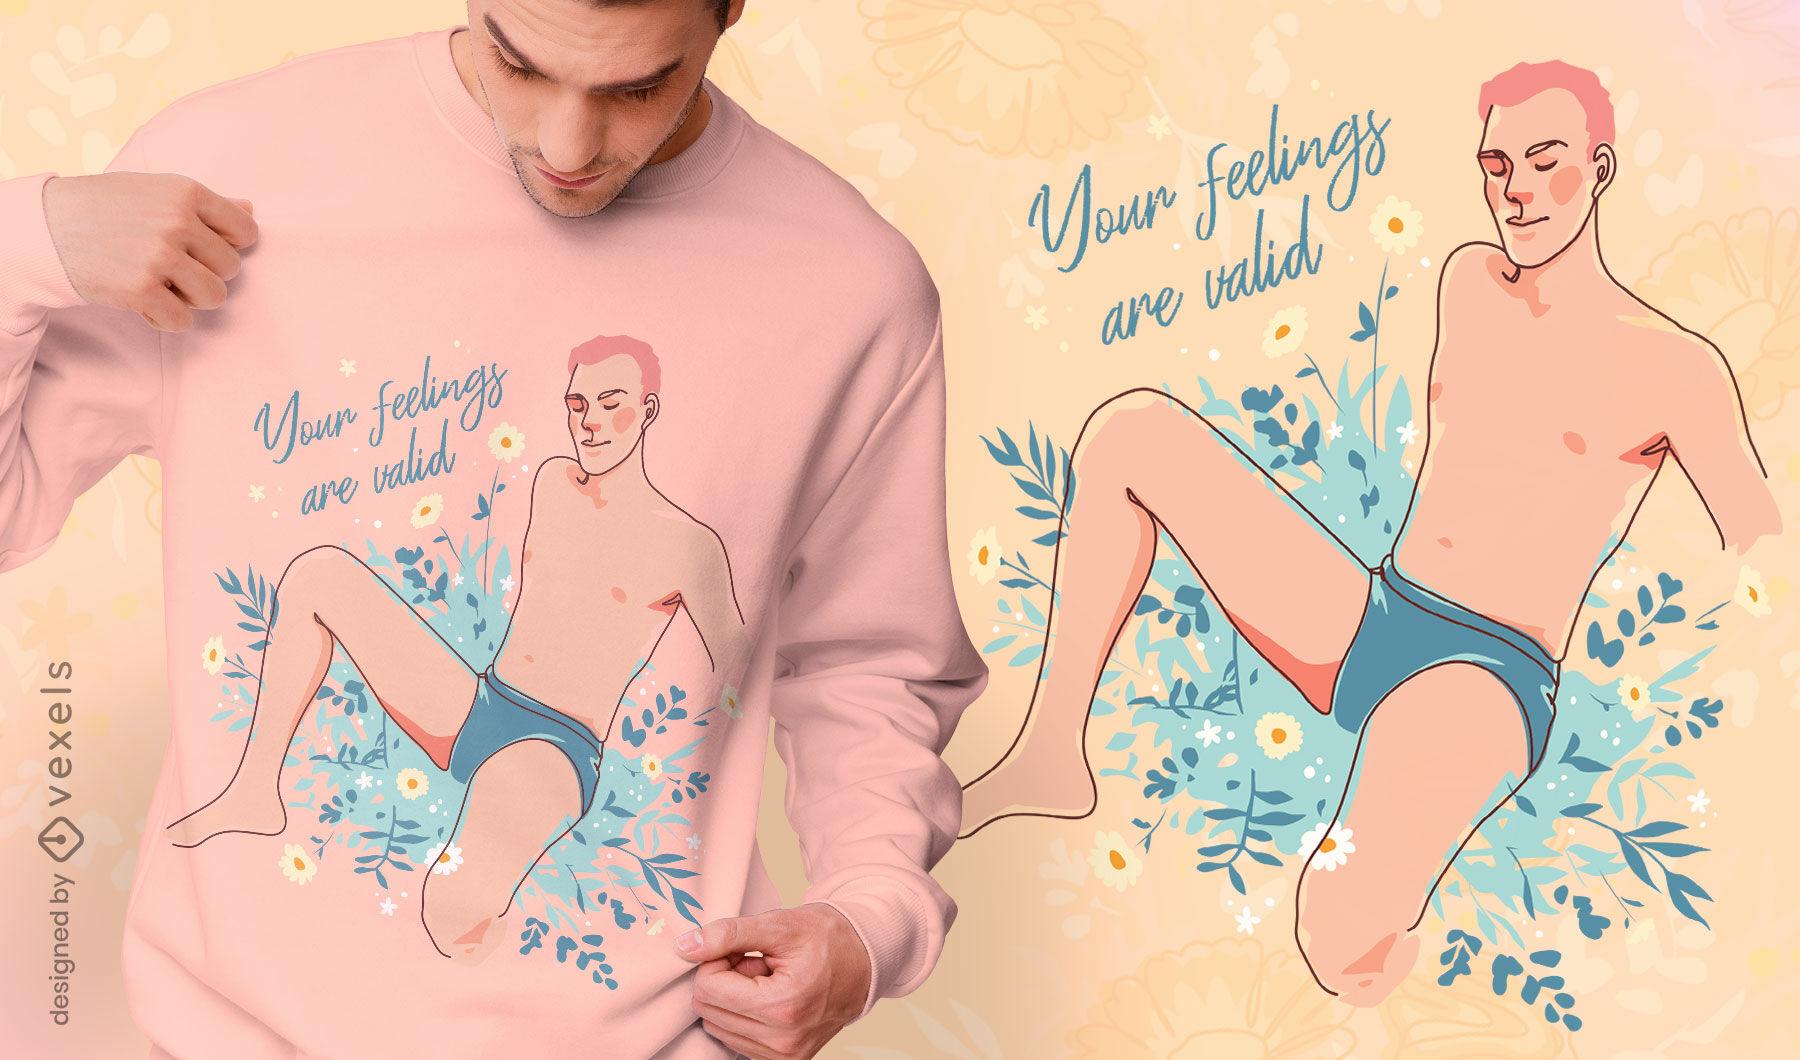 Valid feelings t-shirt design